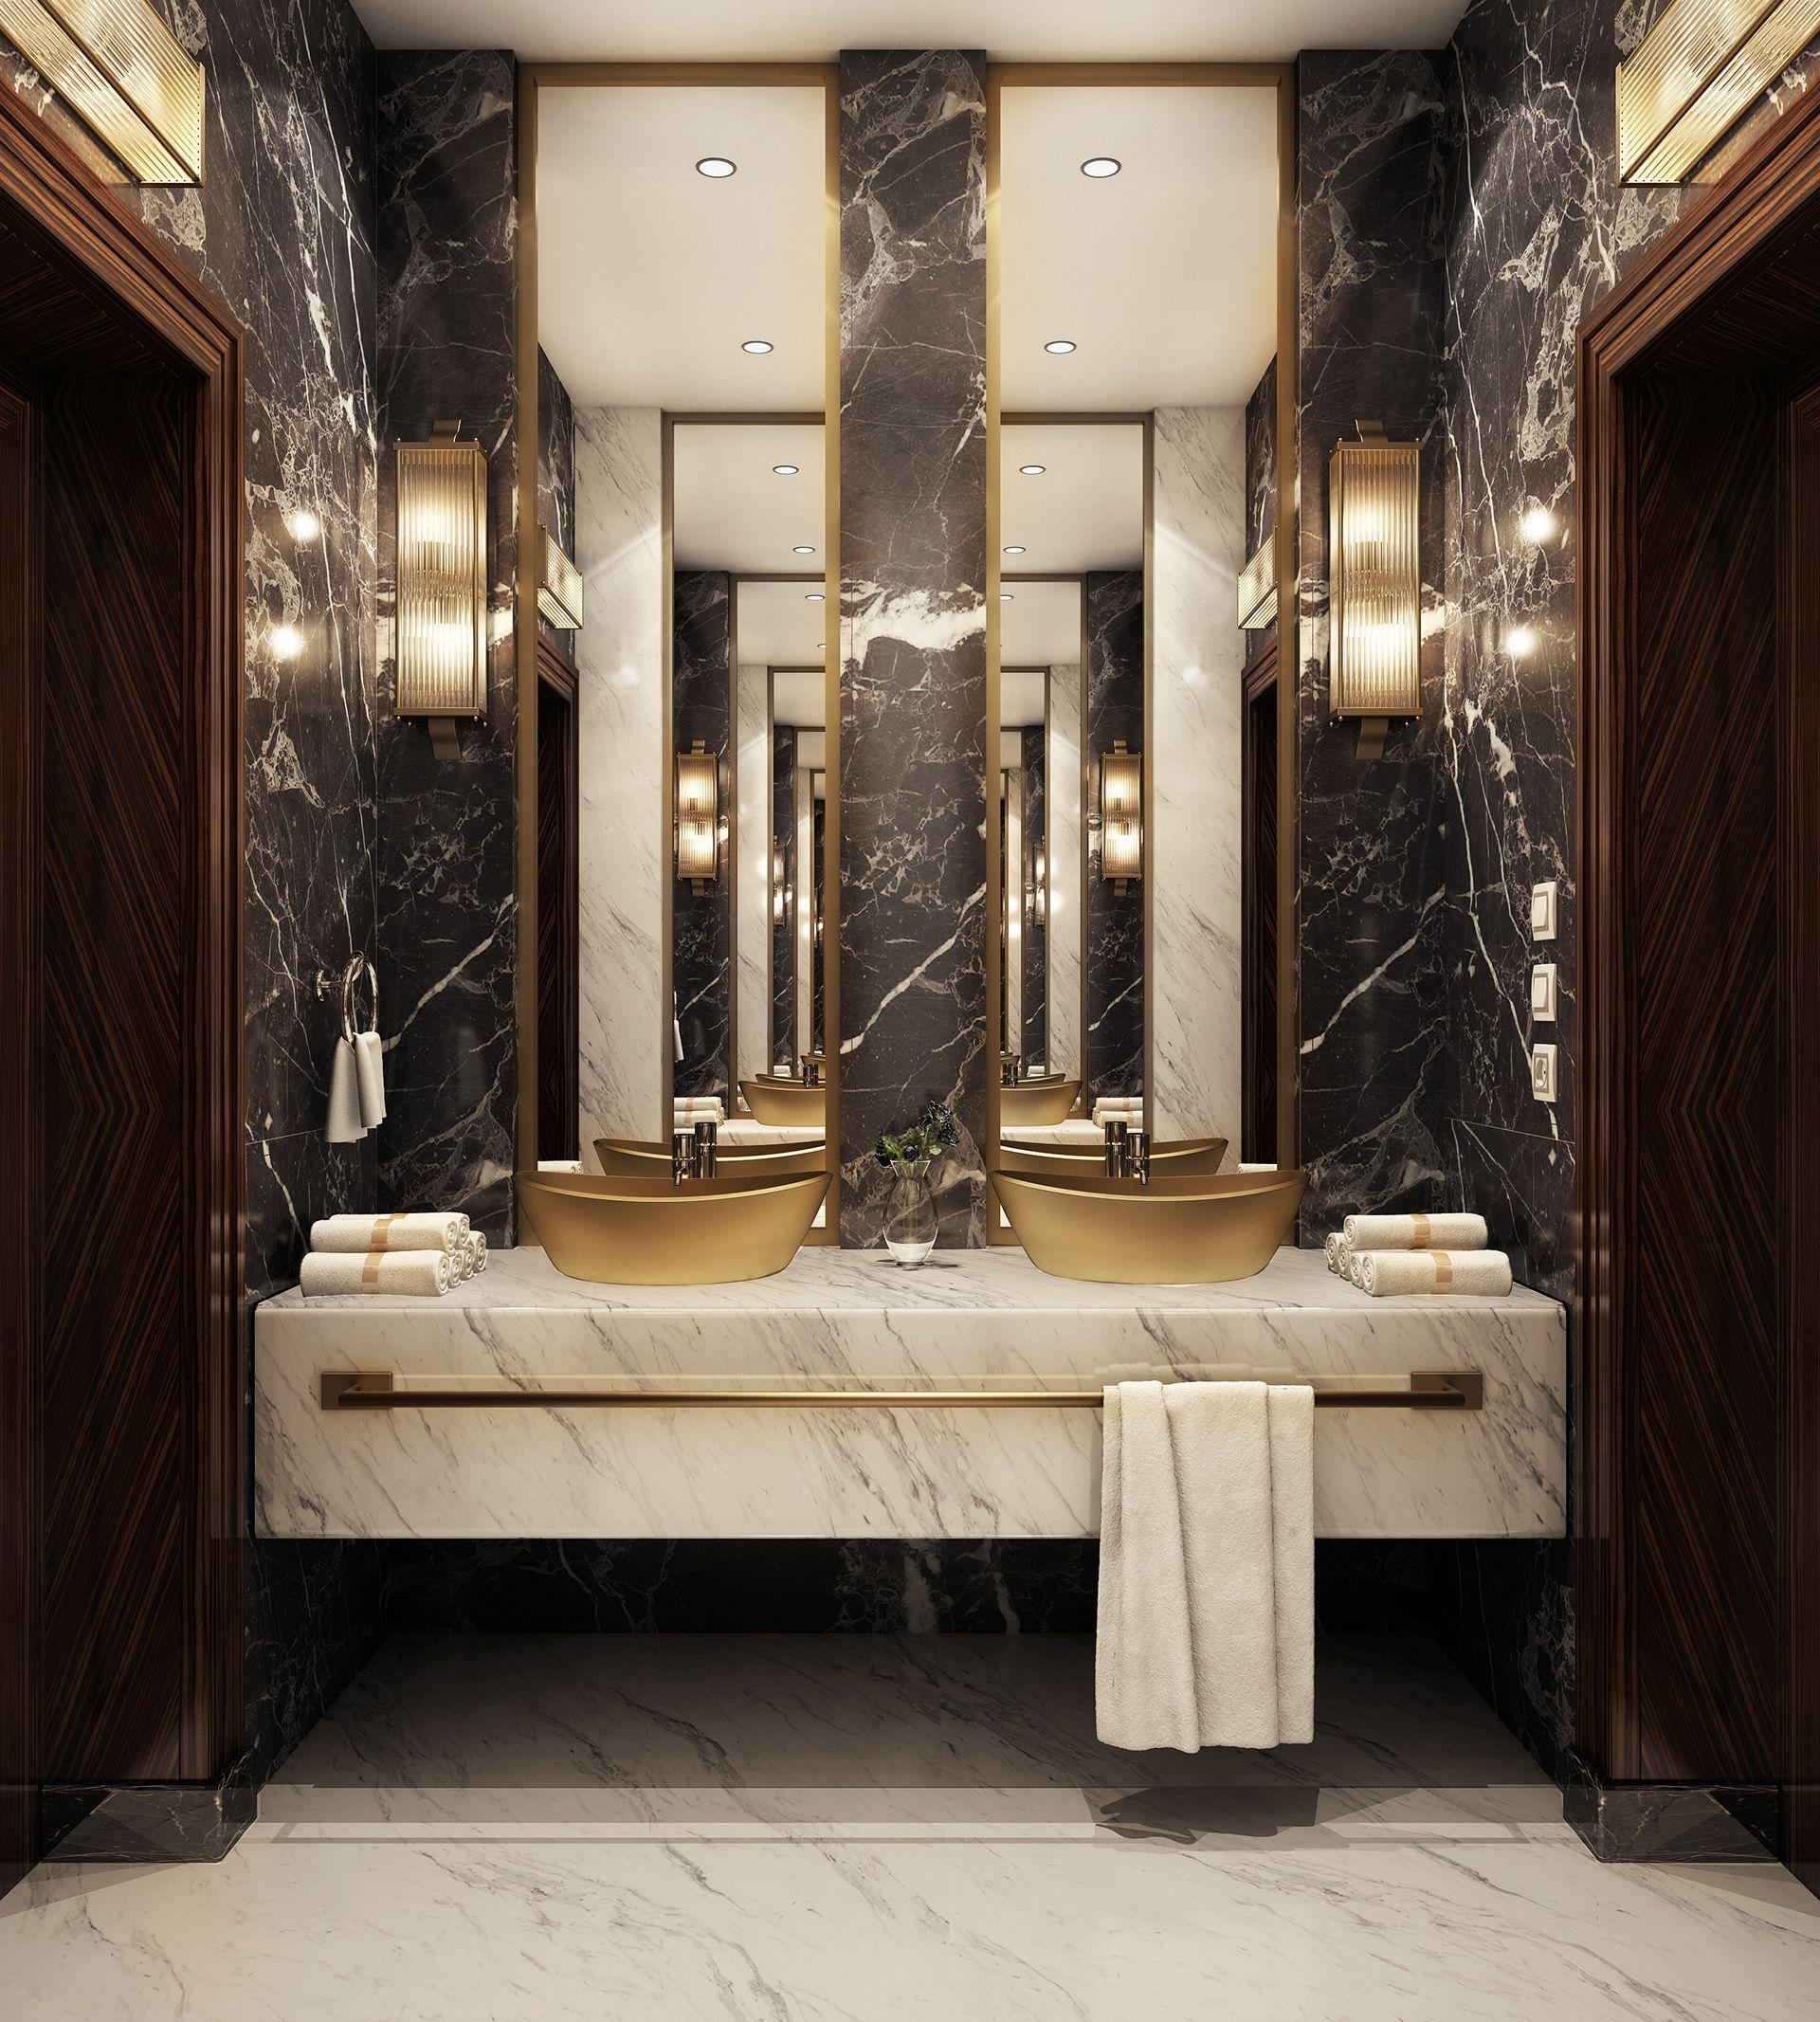 Modern Luxury Bathroom On Behance Modern Luxury Bathroom Bathroom Design Luxury Luxury Bathroom Master Baths